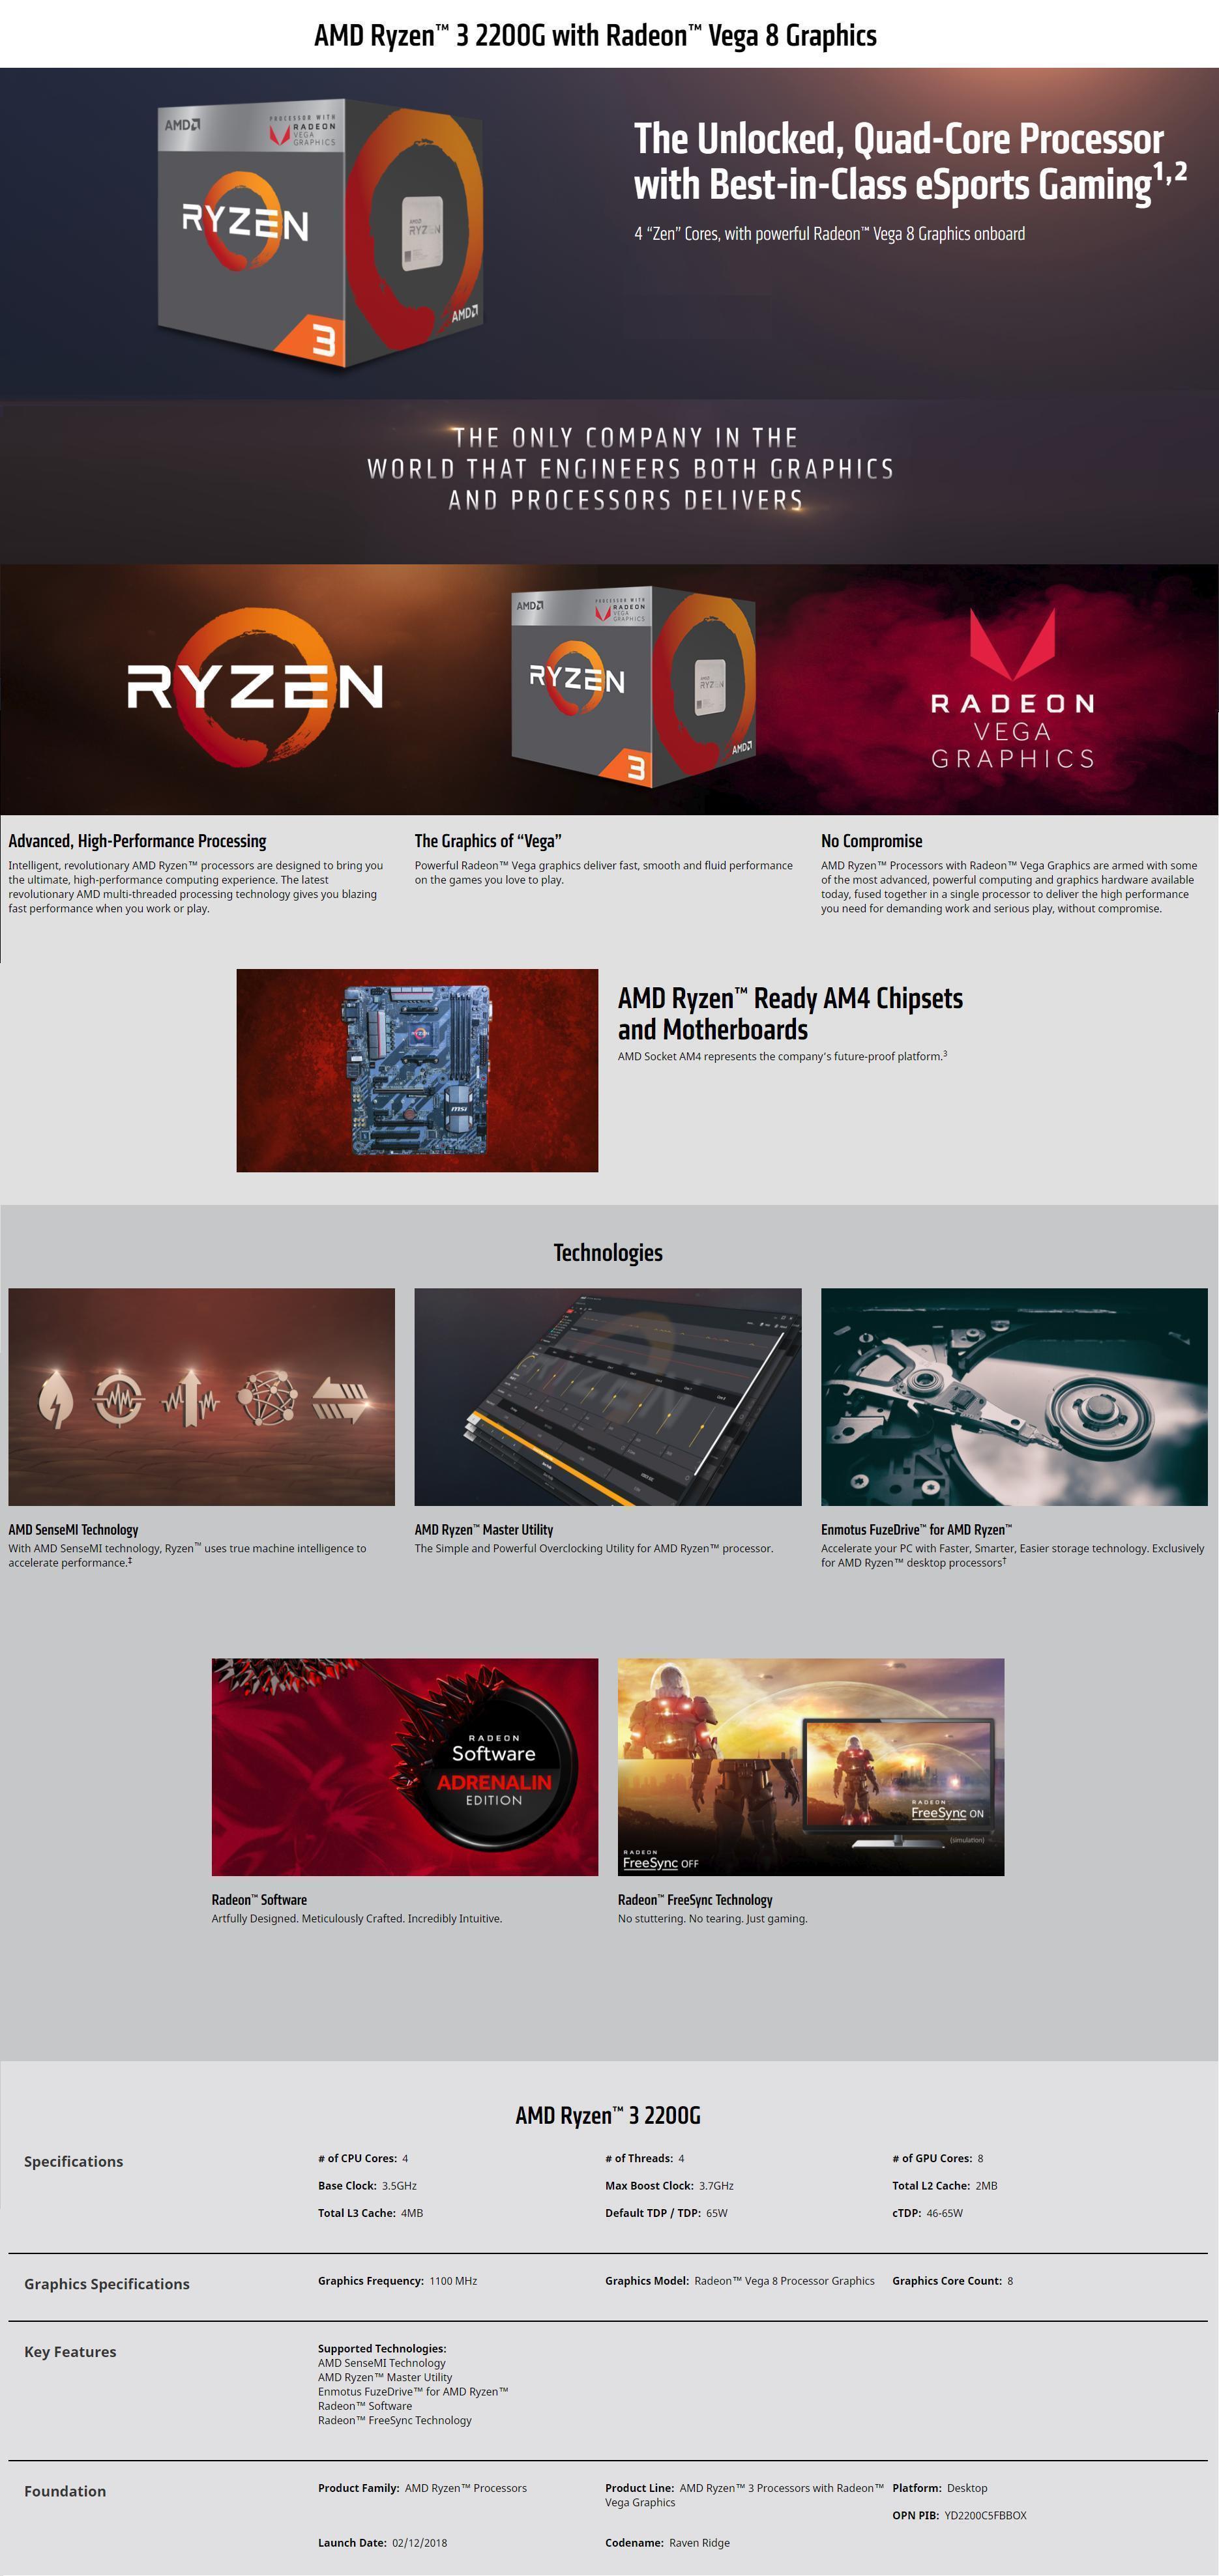 Product details of AMD RYZEN 3 2200G PROCESSOR WITH RADEON VEGA 8 GRAPHICS